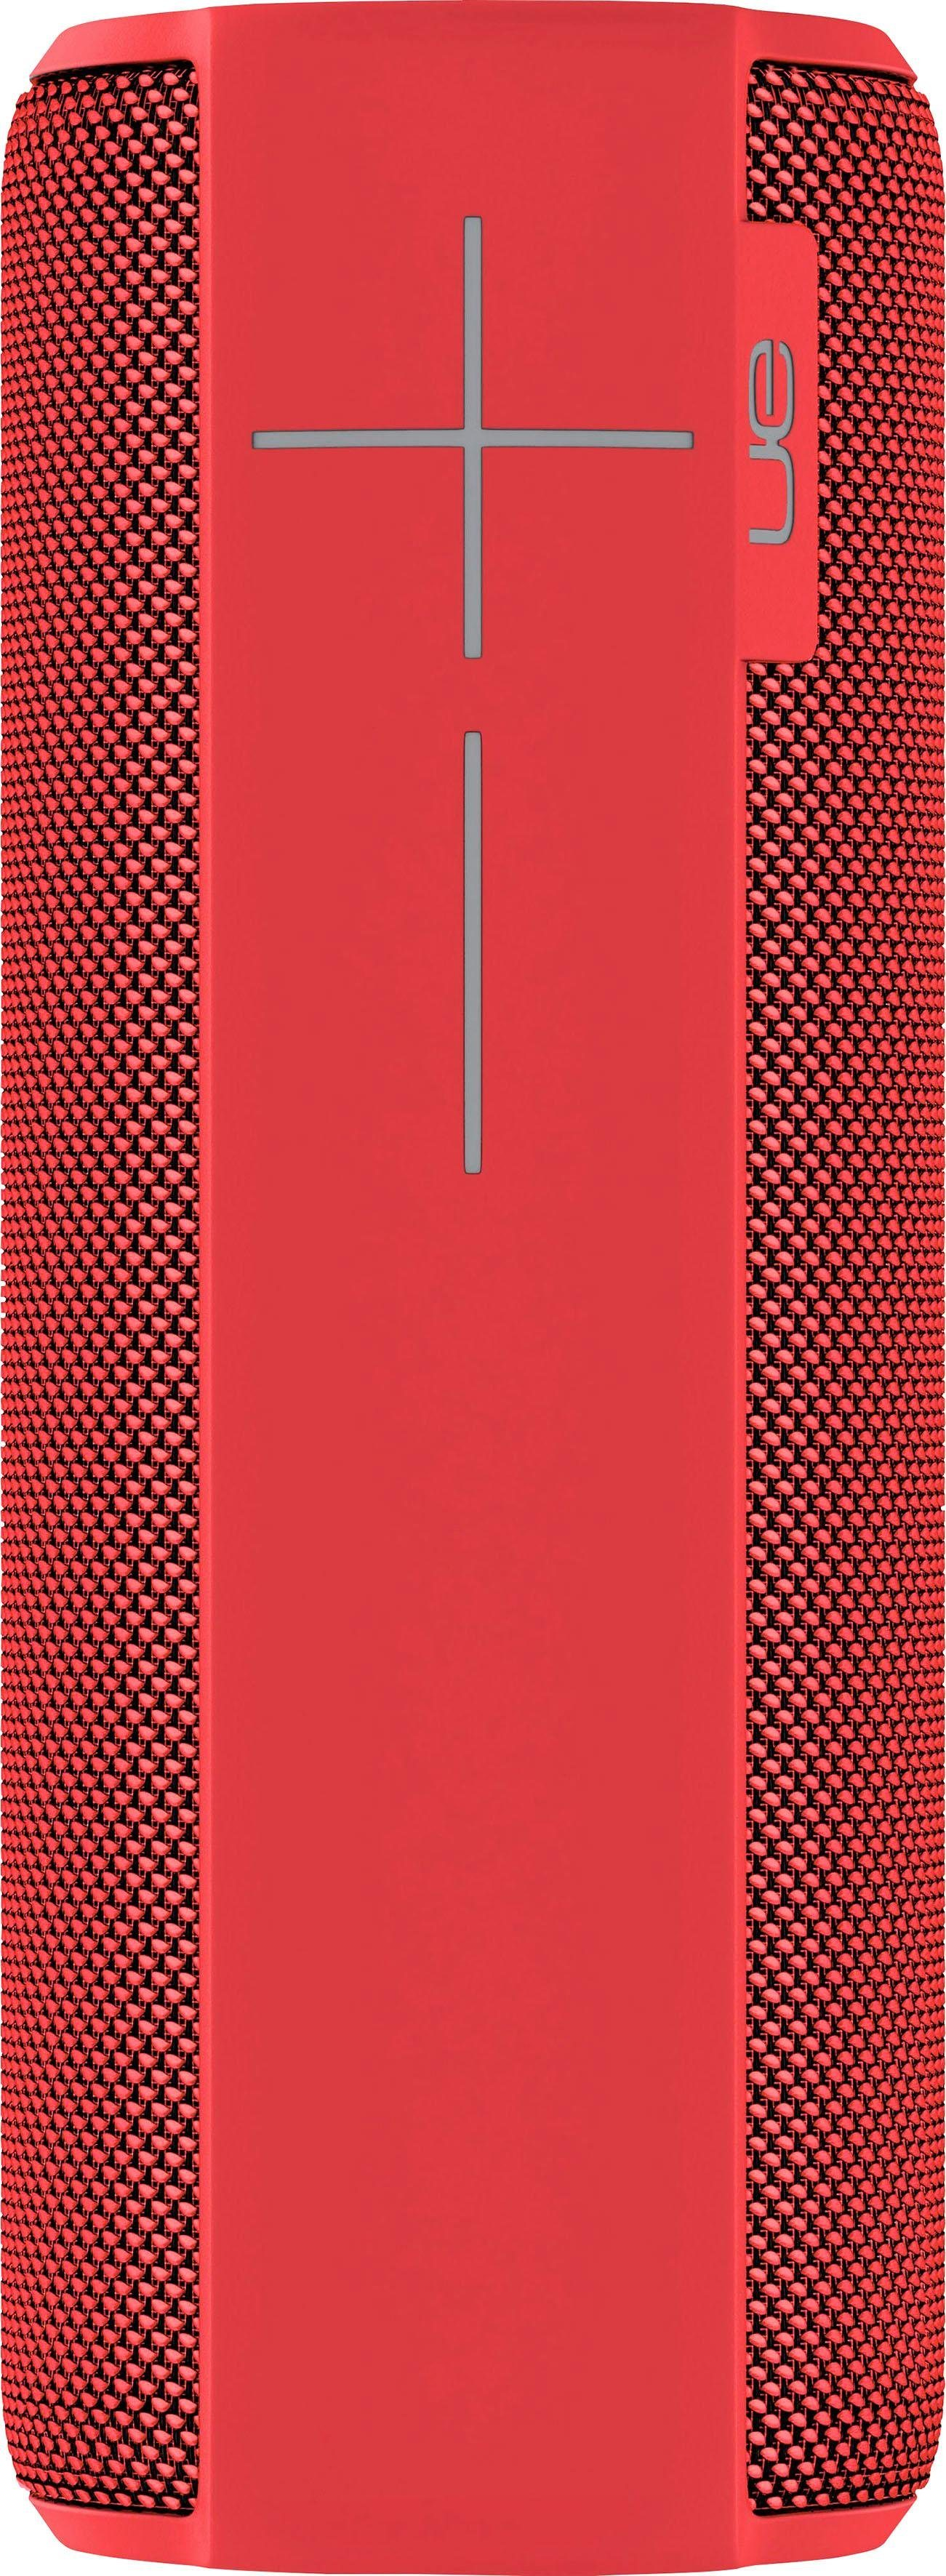 MEGABOOM 1.0 Portable-Lautsprecher (Bluetooth, NFC, Freisprechfunktion, App-Steuerung)